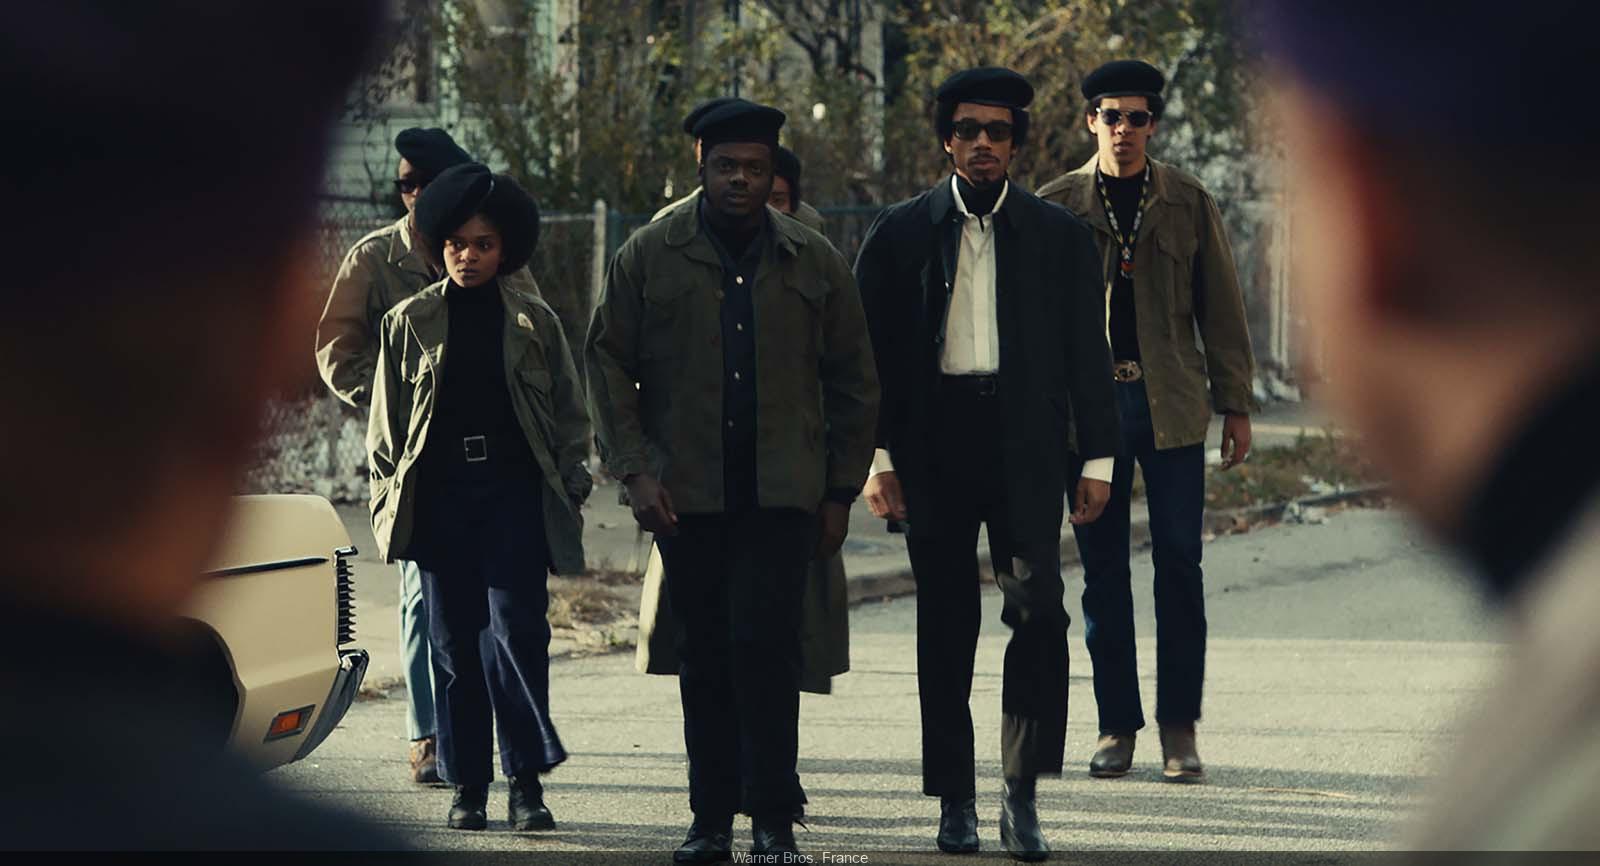 Judas and the Black Messiah avec Daniel Kaluuya : diffusion sur Canal+  avant la sortie digitale - Sortiraparis.com